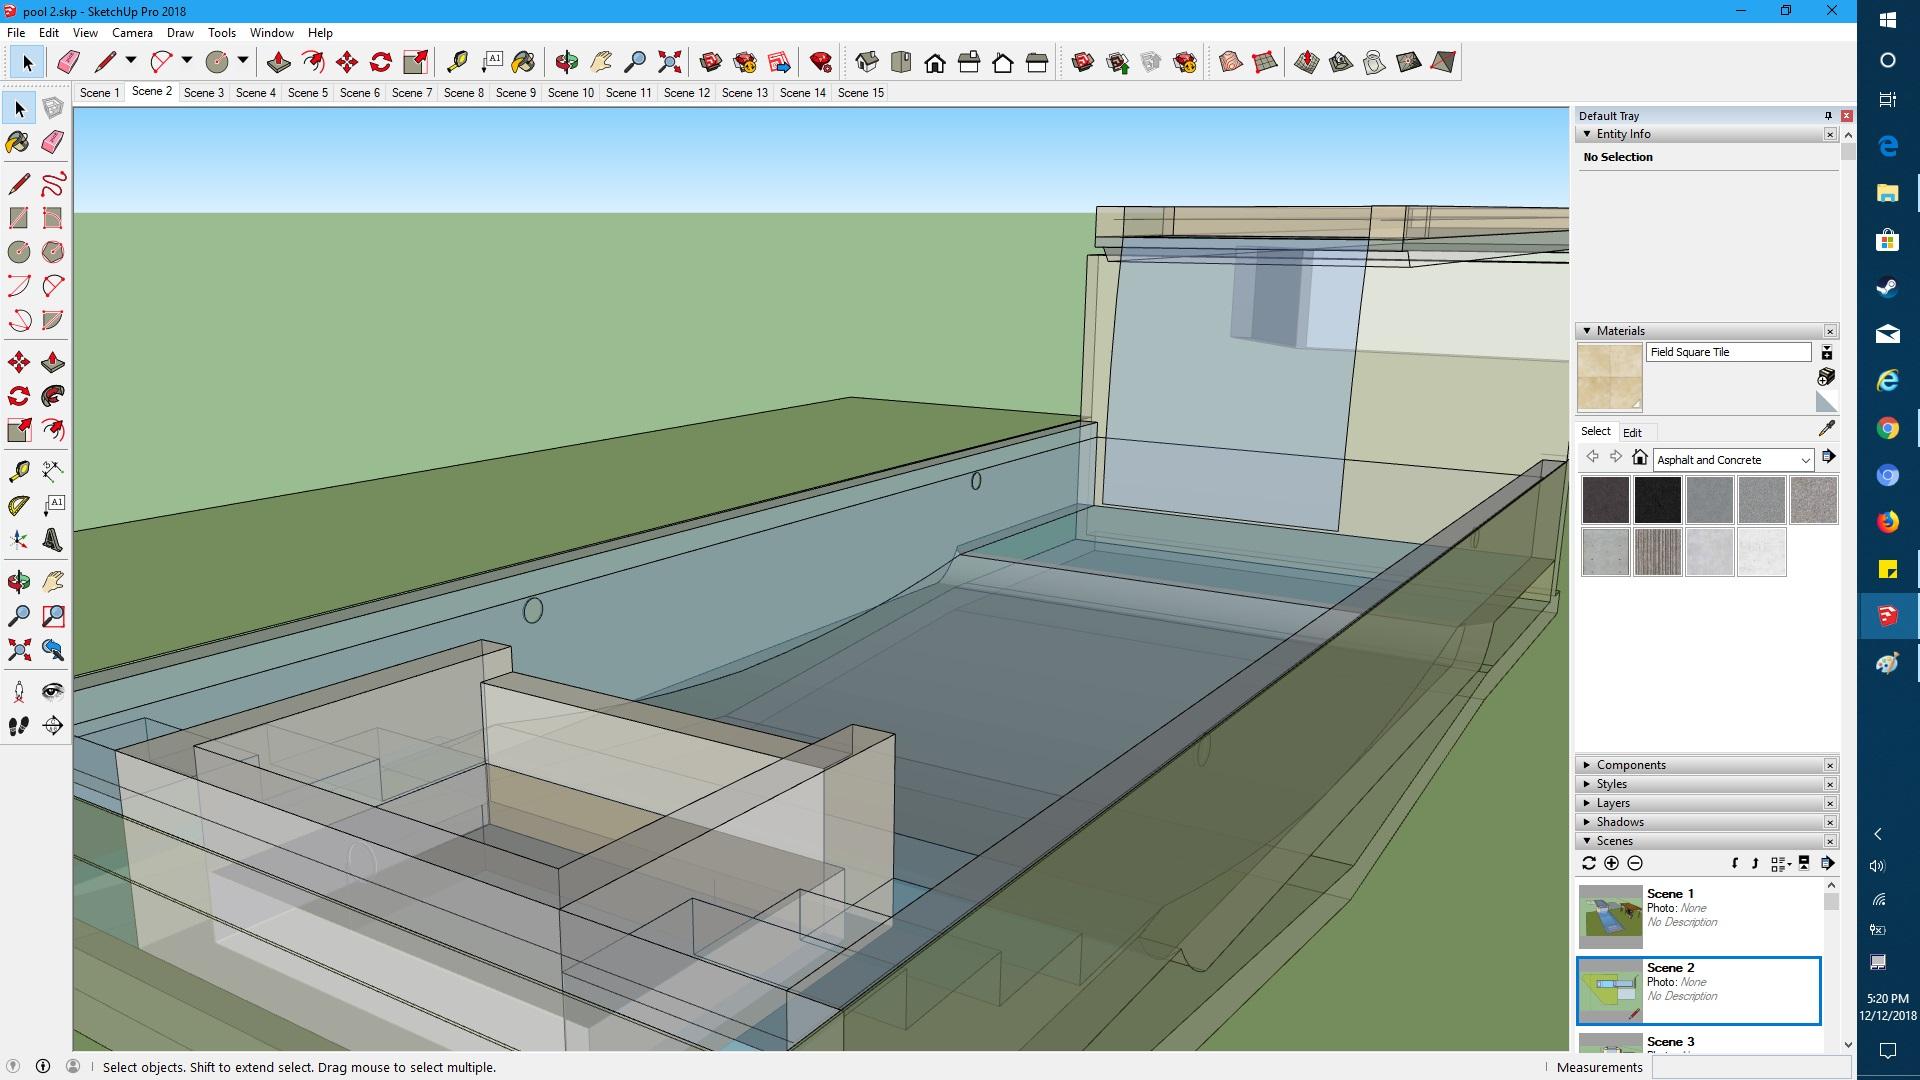 July 30 Screen Shot – Luxury Pool Spa Construction